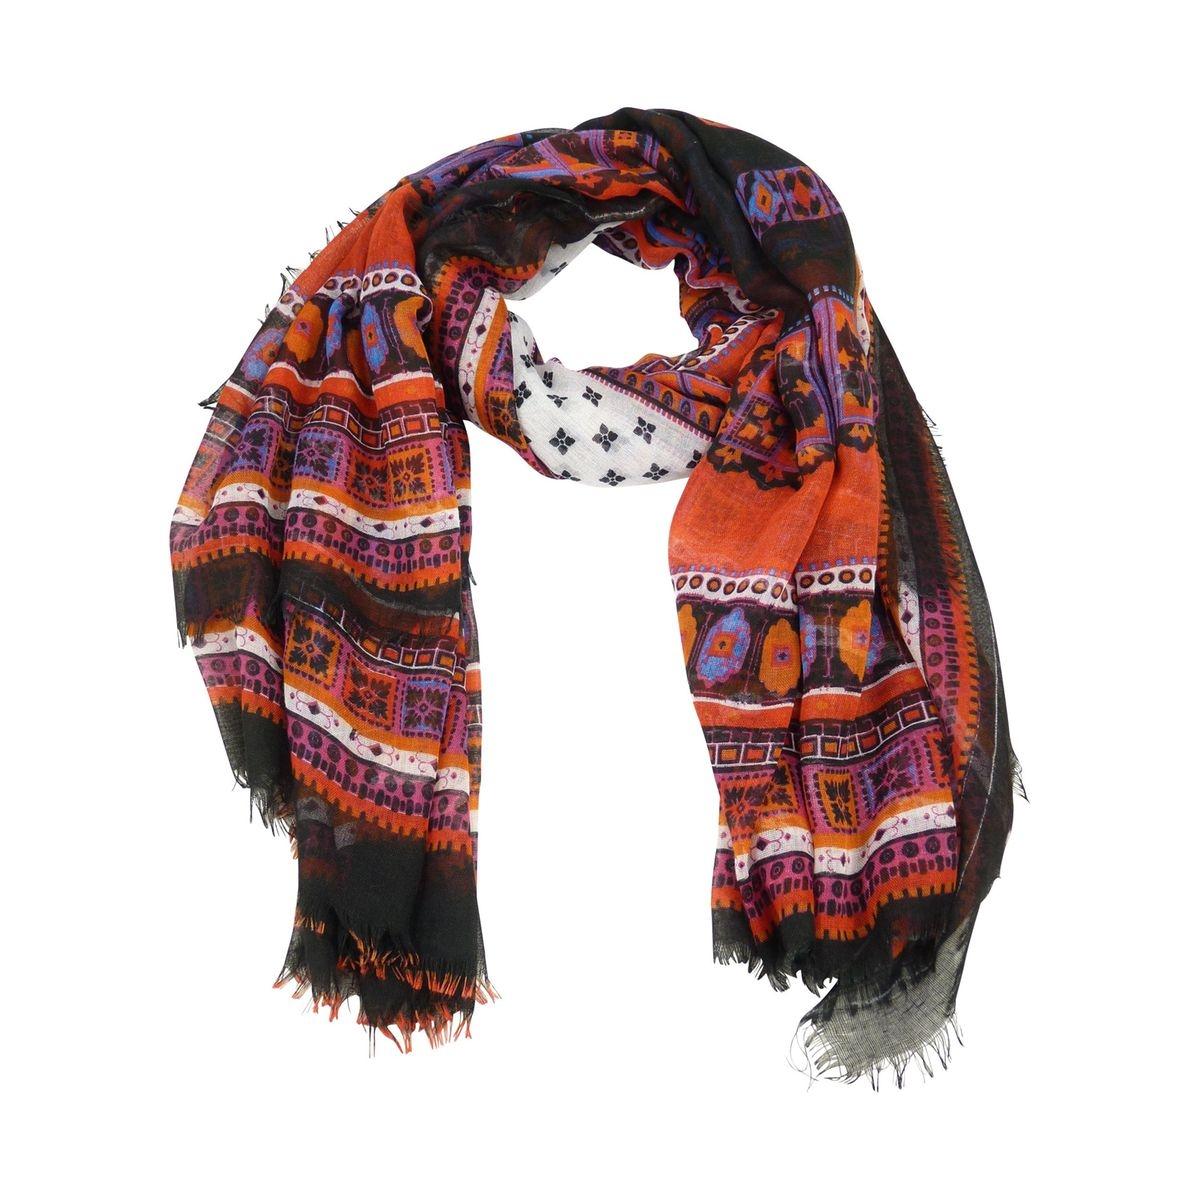 Foulard echarpe imprimé ethnique femme